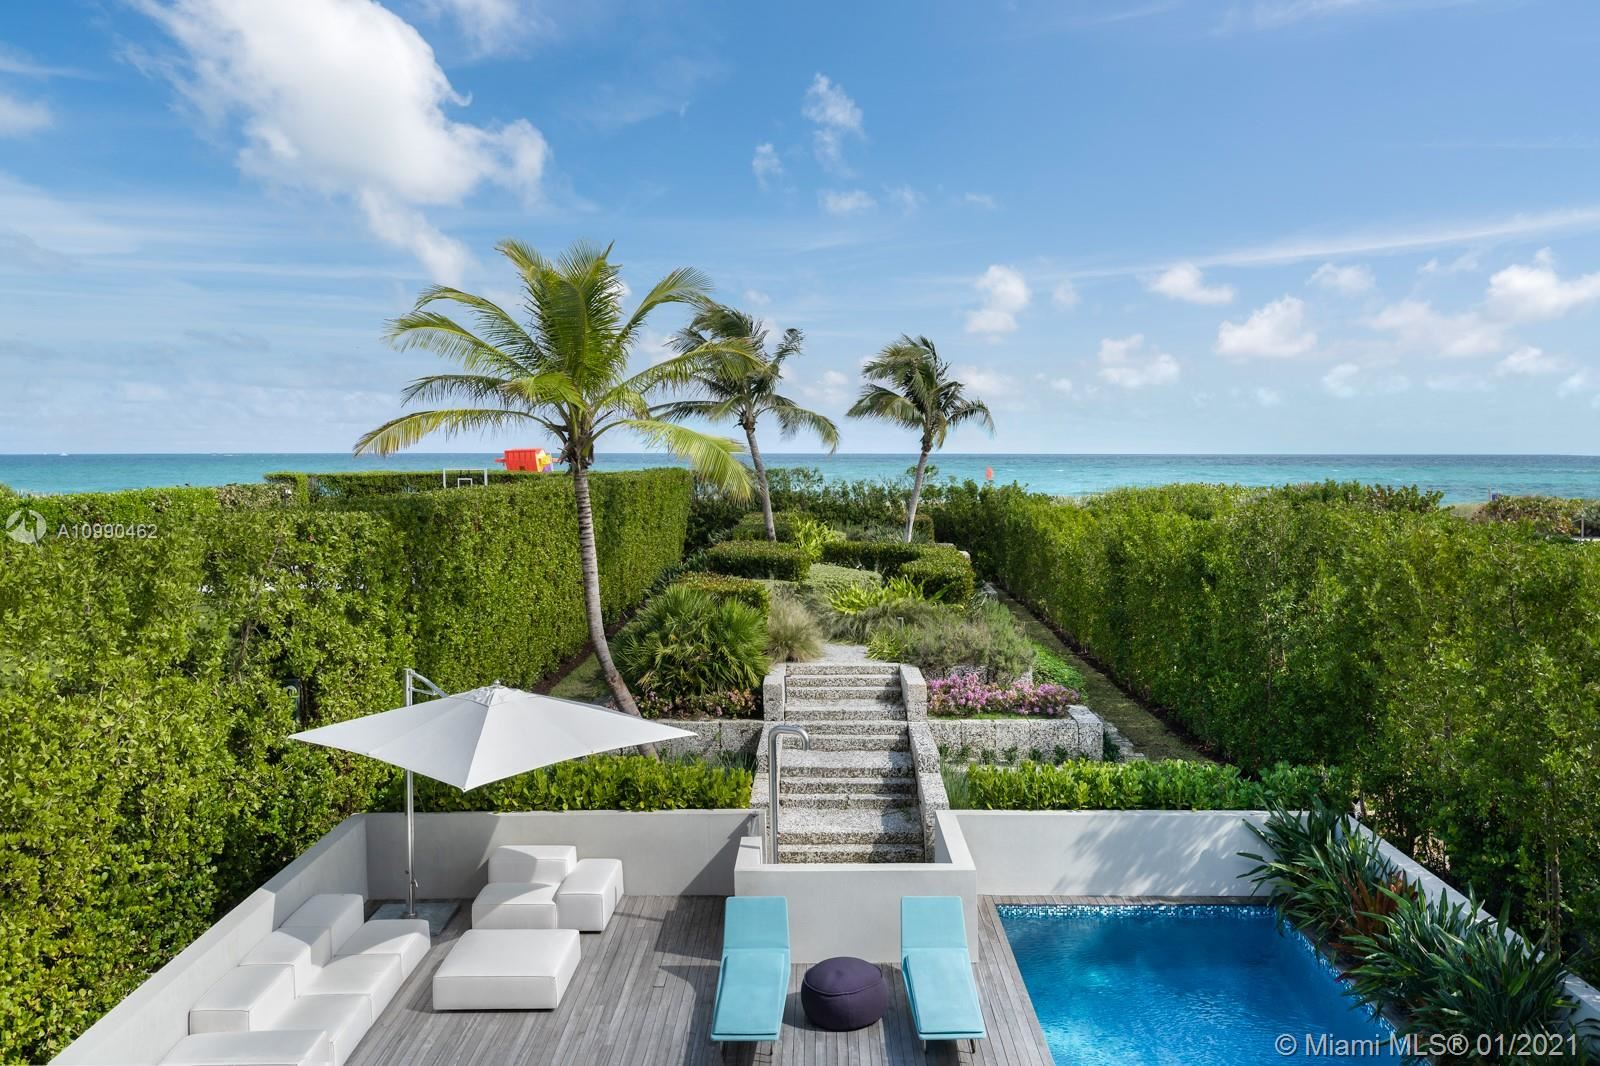 Photo of 7709 Atlantic Way, Miami Beach, FL 33141 (MLS # A10990462)